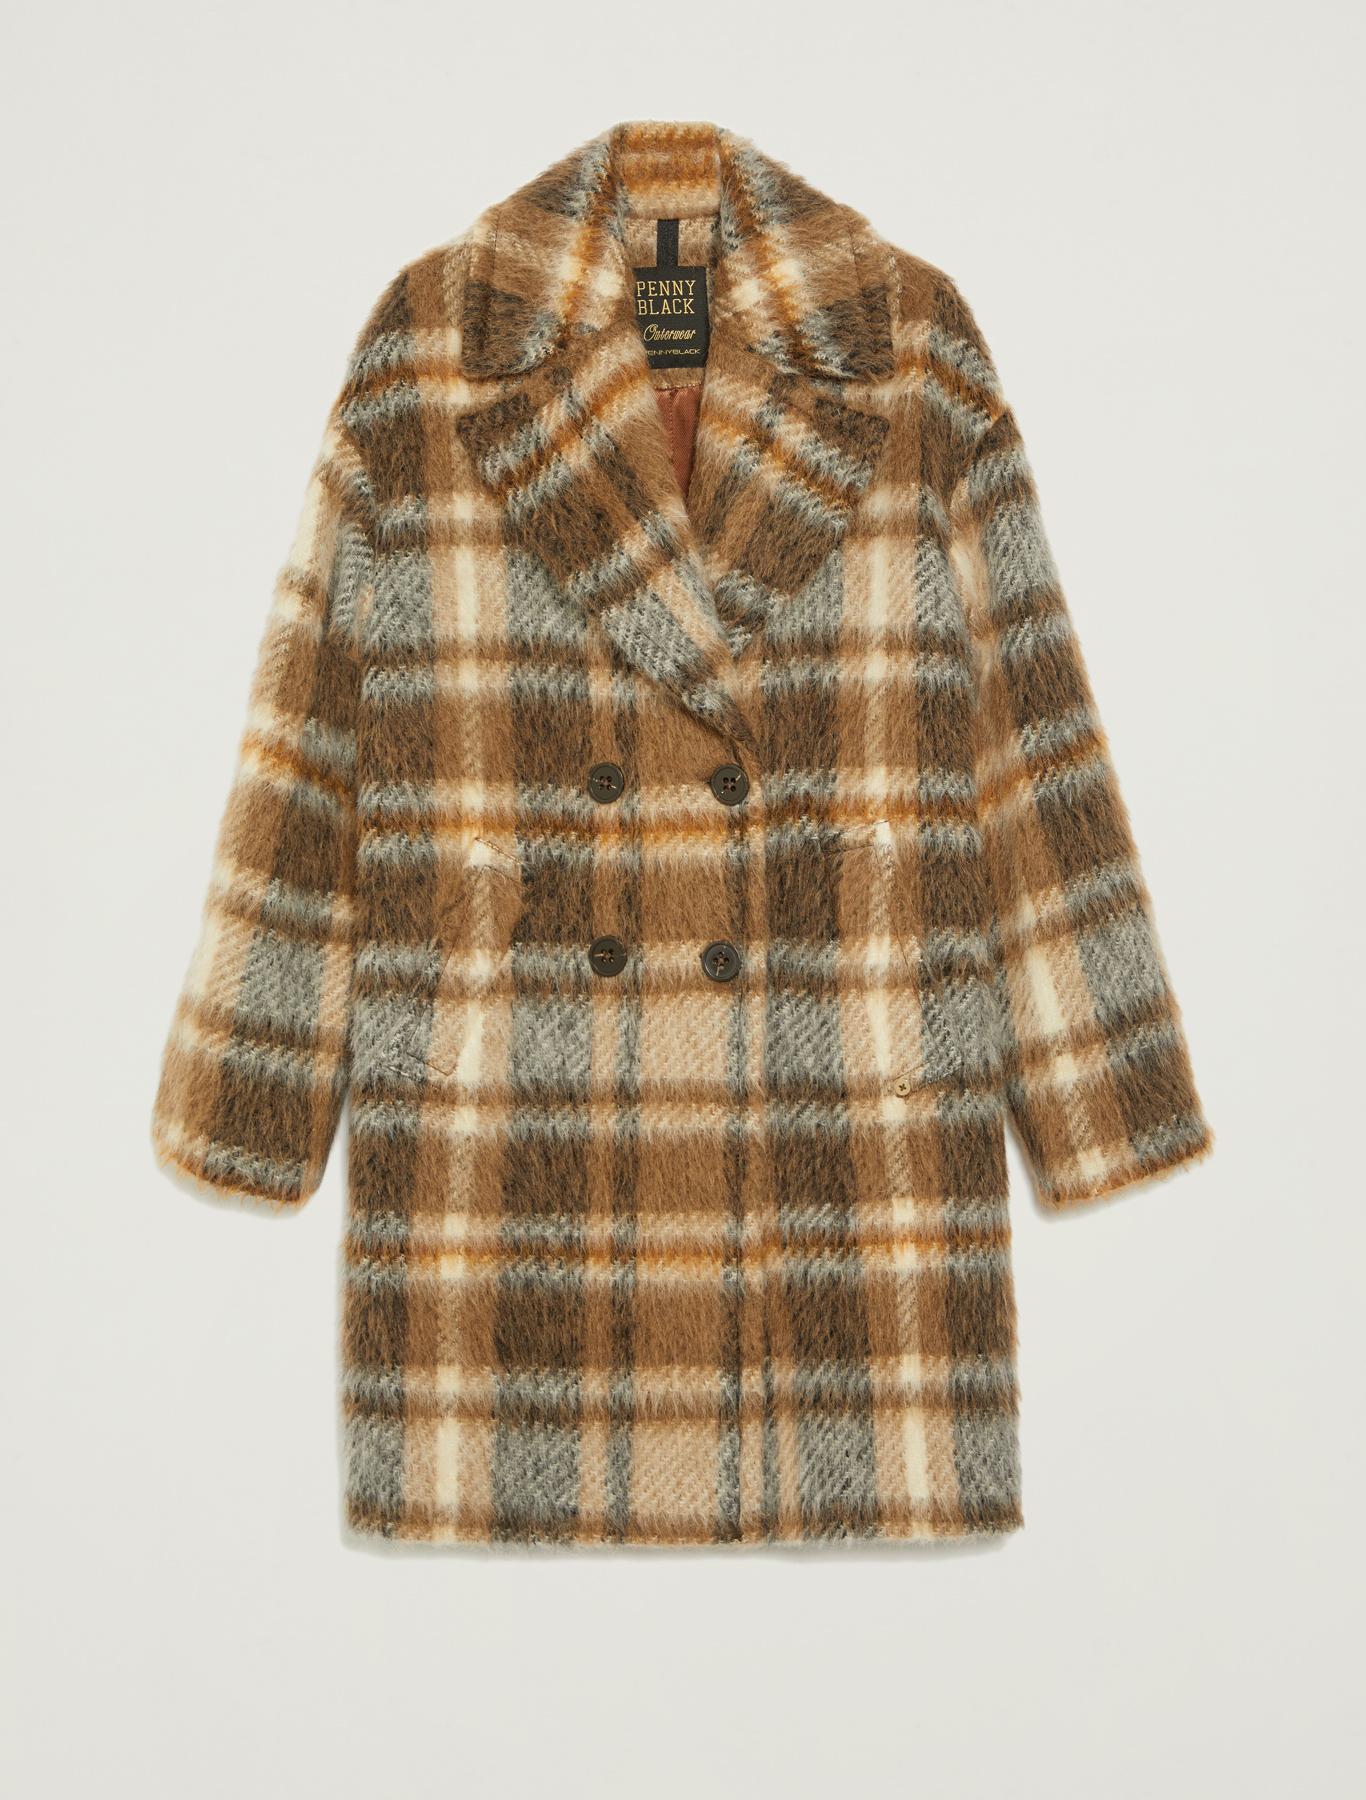 Checked coat - camel pattern - pennyblack